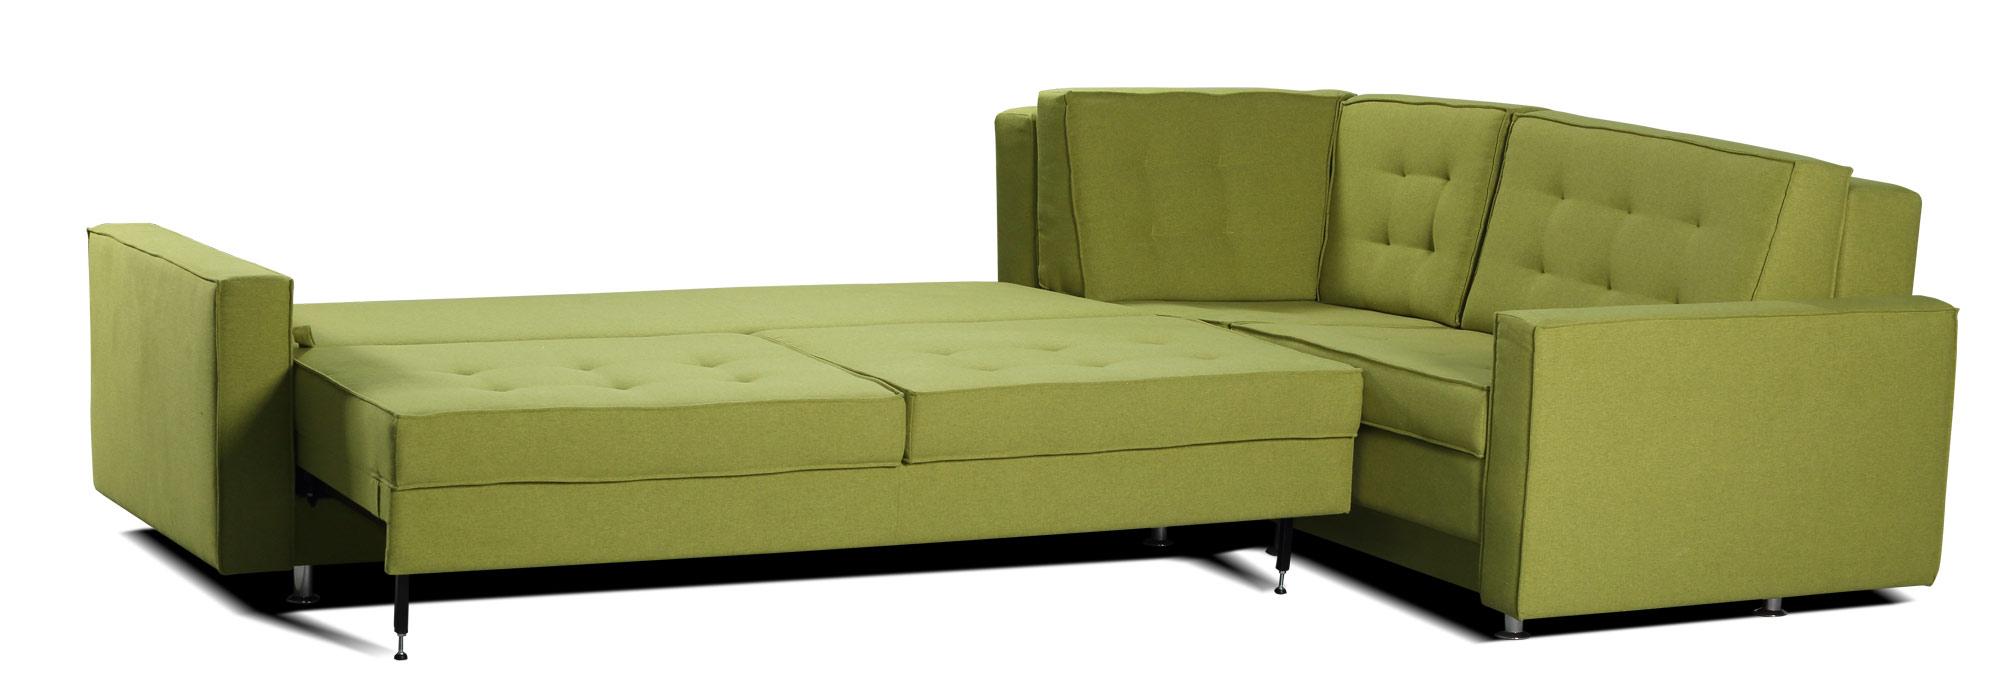 carrera naro nik salon meblowy vega meble. Black Bedroom Furniture Sets. Home Design Ideas